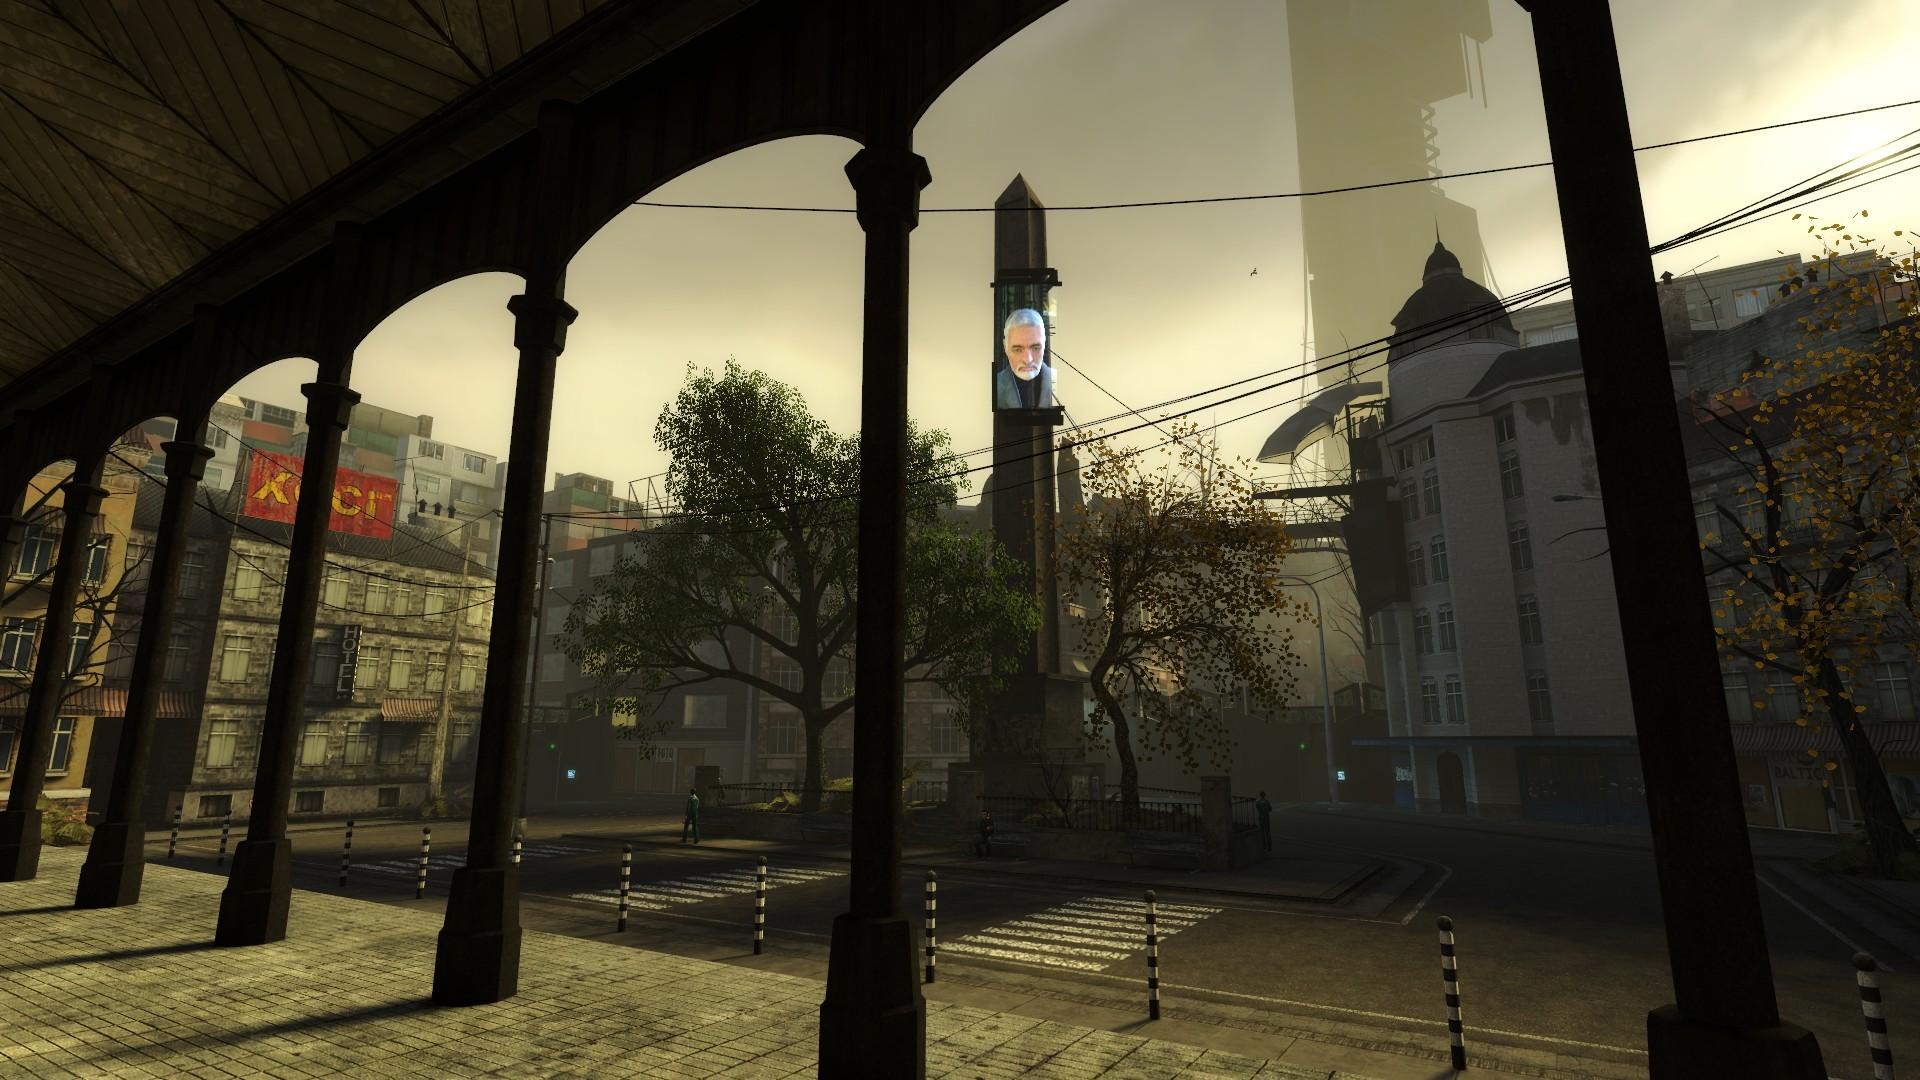 … Half-Life 2 Wallpaper 1 by k3Ck